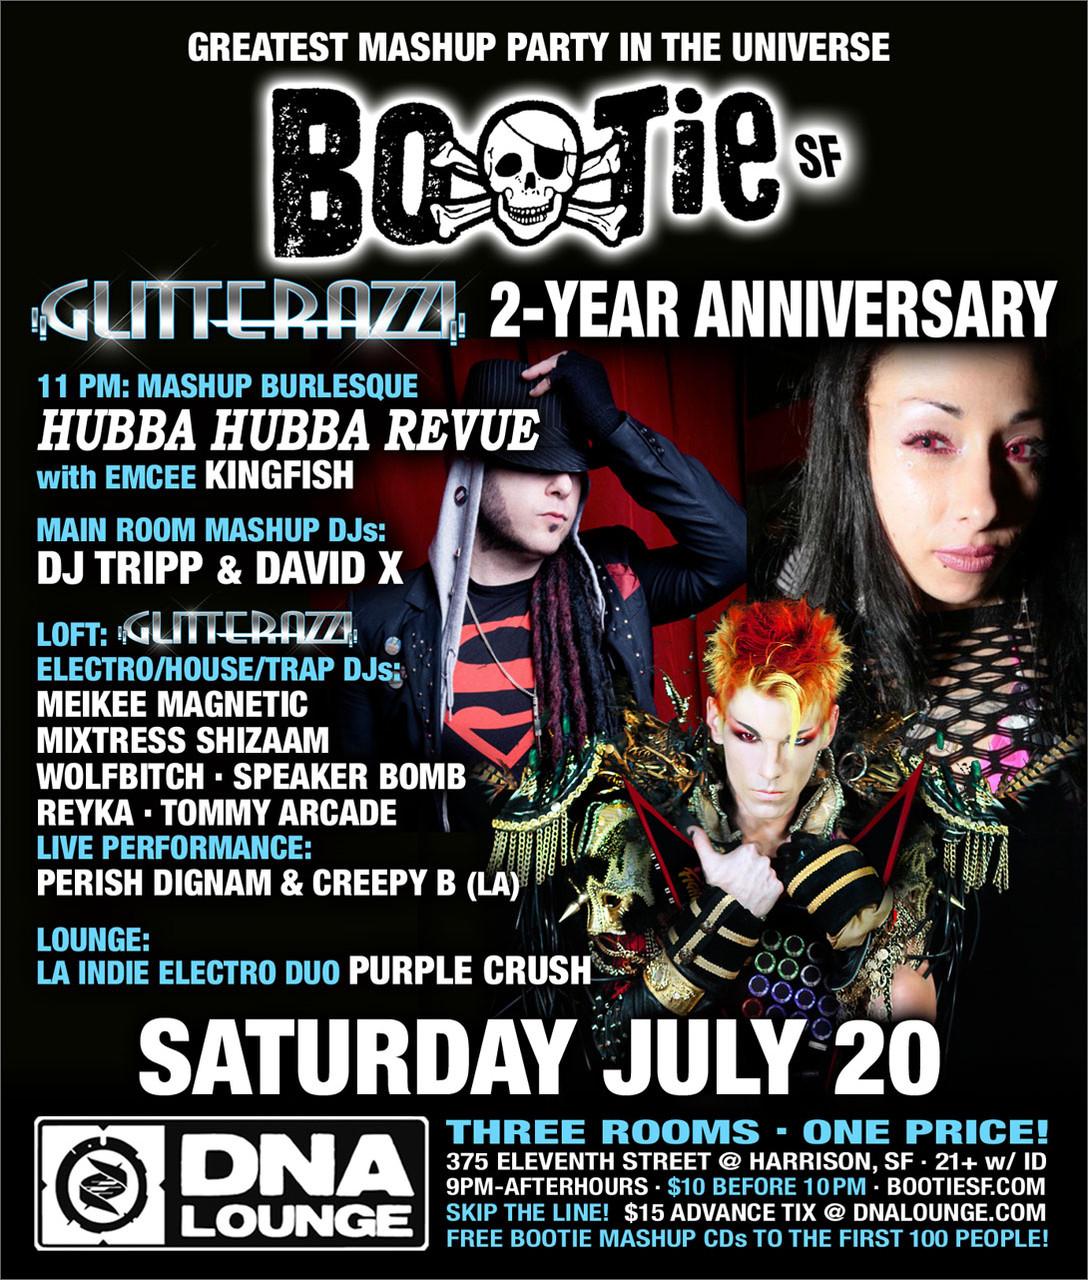 DJ Meikee Magnetic Celebrates Glitterazzi at Bootie